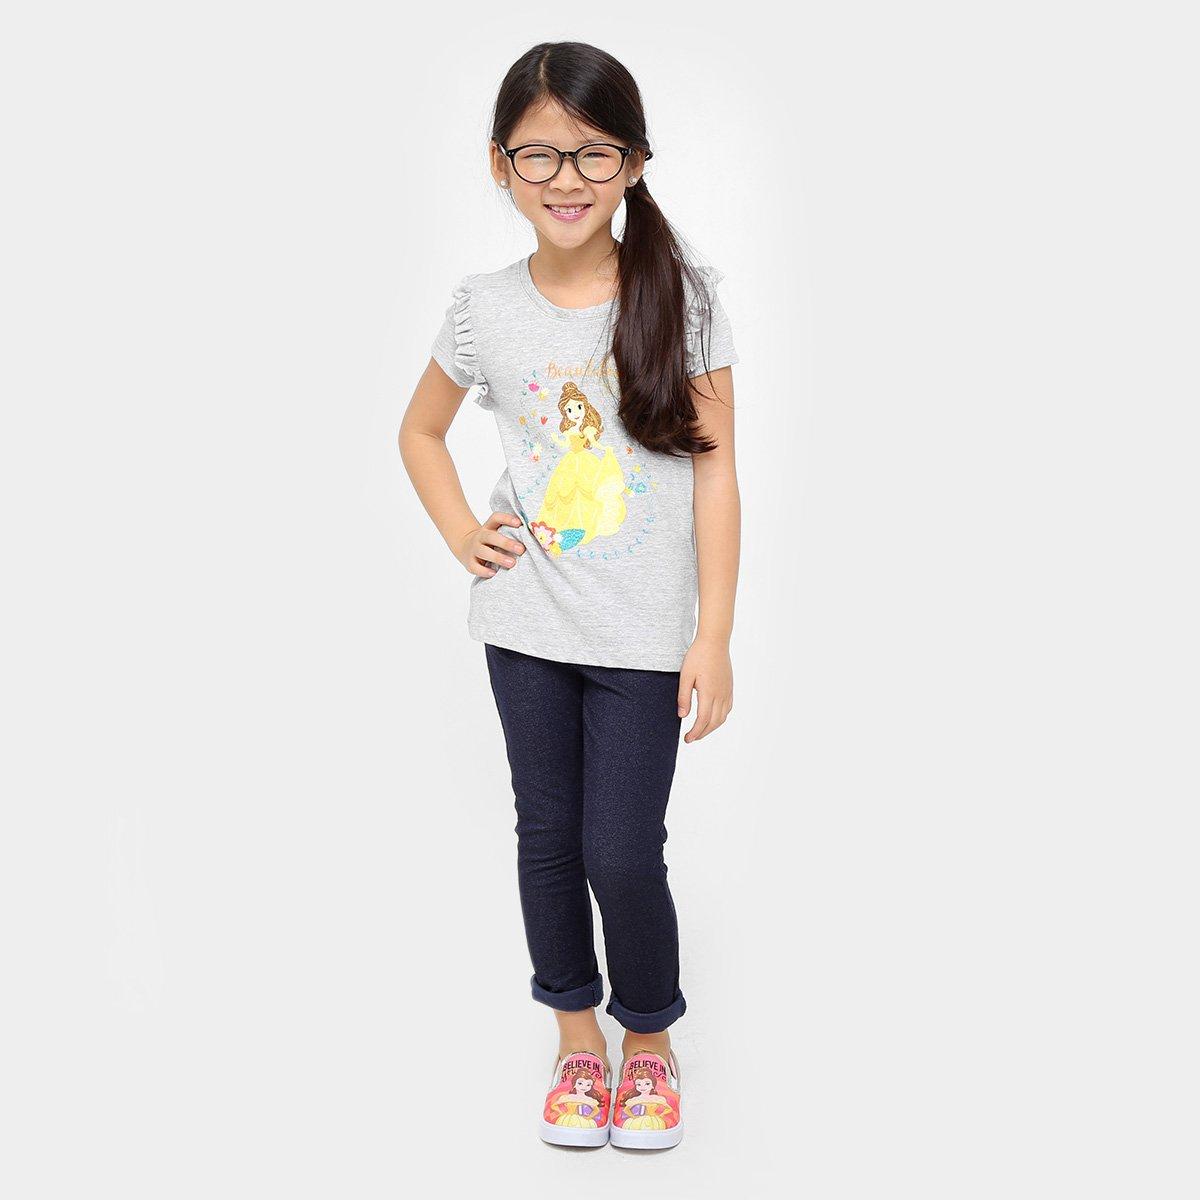 Bela Infantil Mescla Disney Camiseta Camiseta Disney wOtxpOz